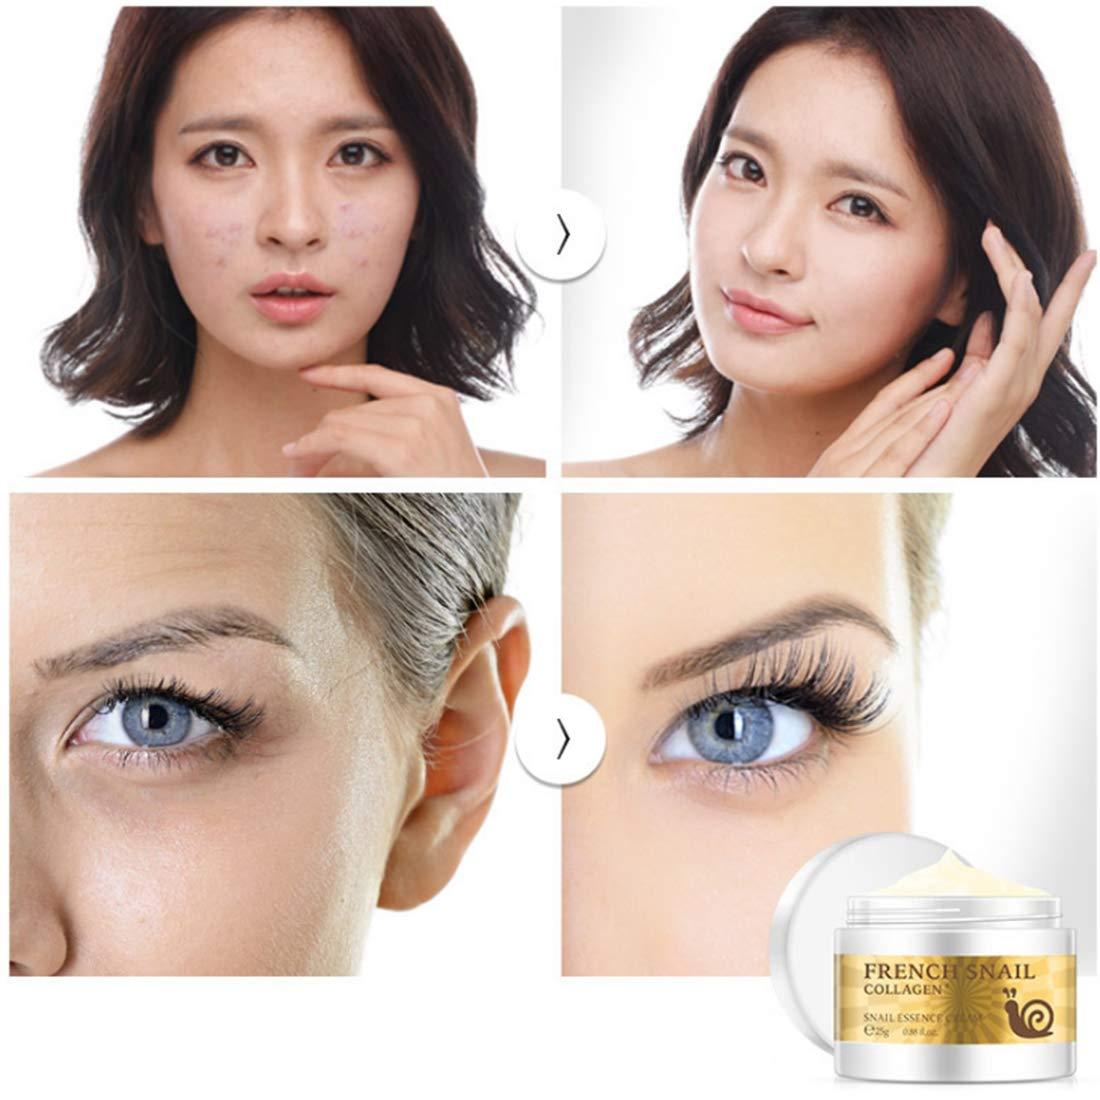 Loweryeah Snail Repair Anti-aging Cream 25g Collagen Moisturizing Nourish Repair Damaged Face Care Hyaluronic Acid Cream by Loweryeah (Image #4)